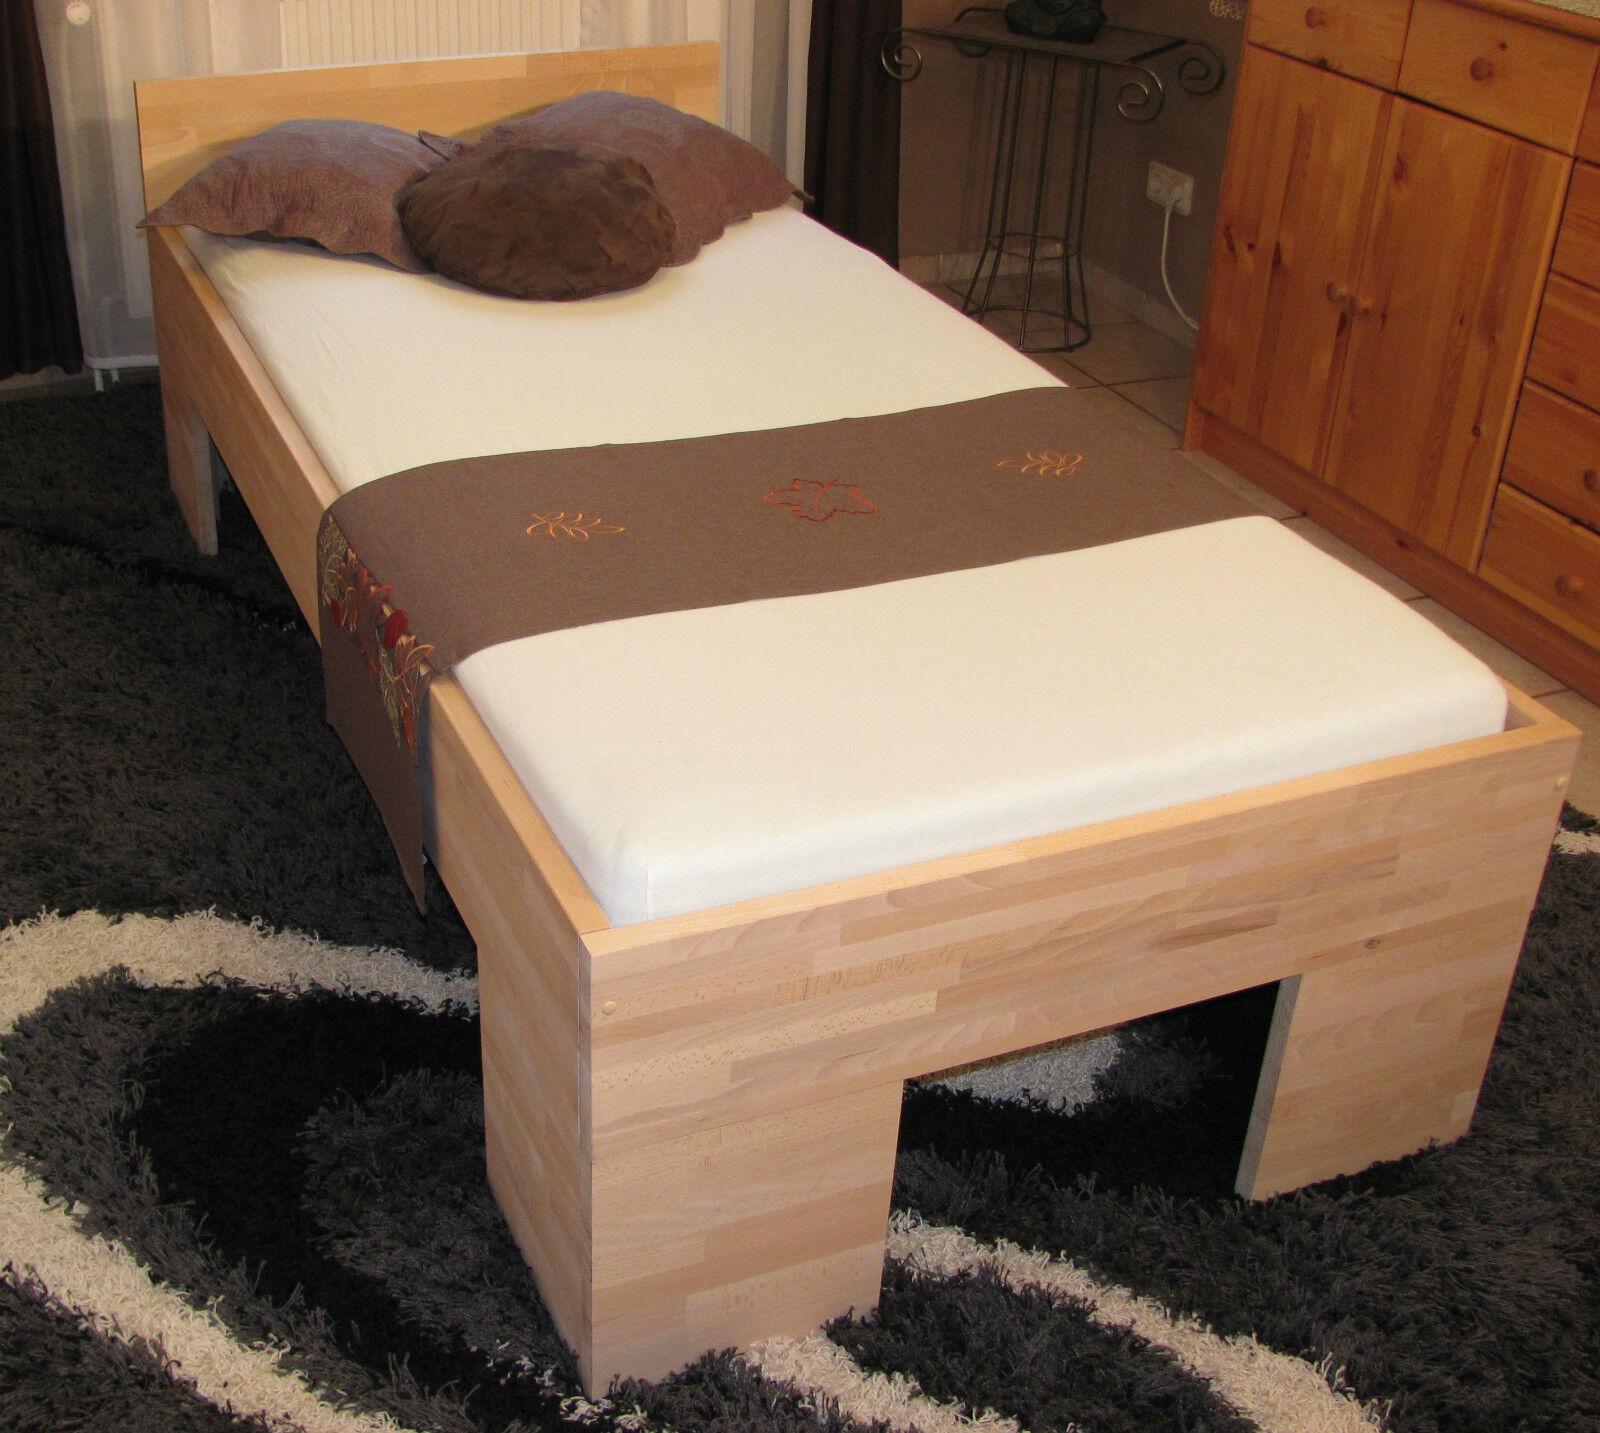 bettgestell bett 120x200 fu ii doppelbett g stebett futonbett schlafzimmer eur 139 00. Black Bedroom Furniture Sets. Home Design Ideas